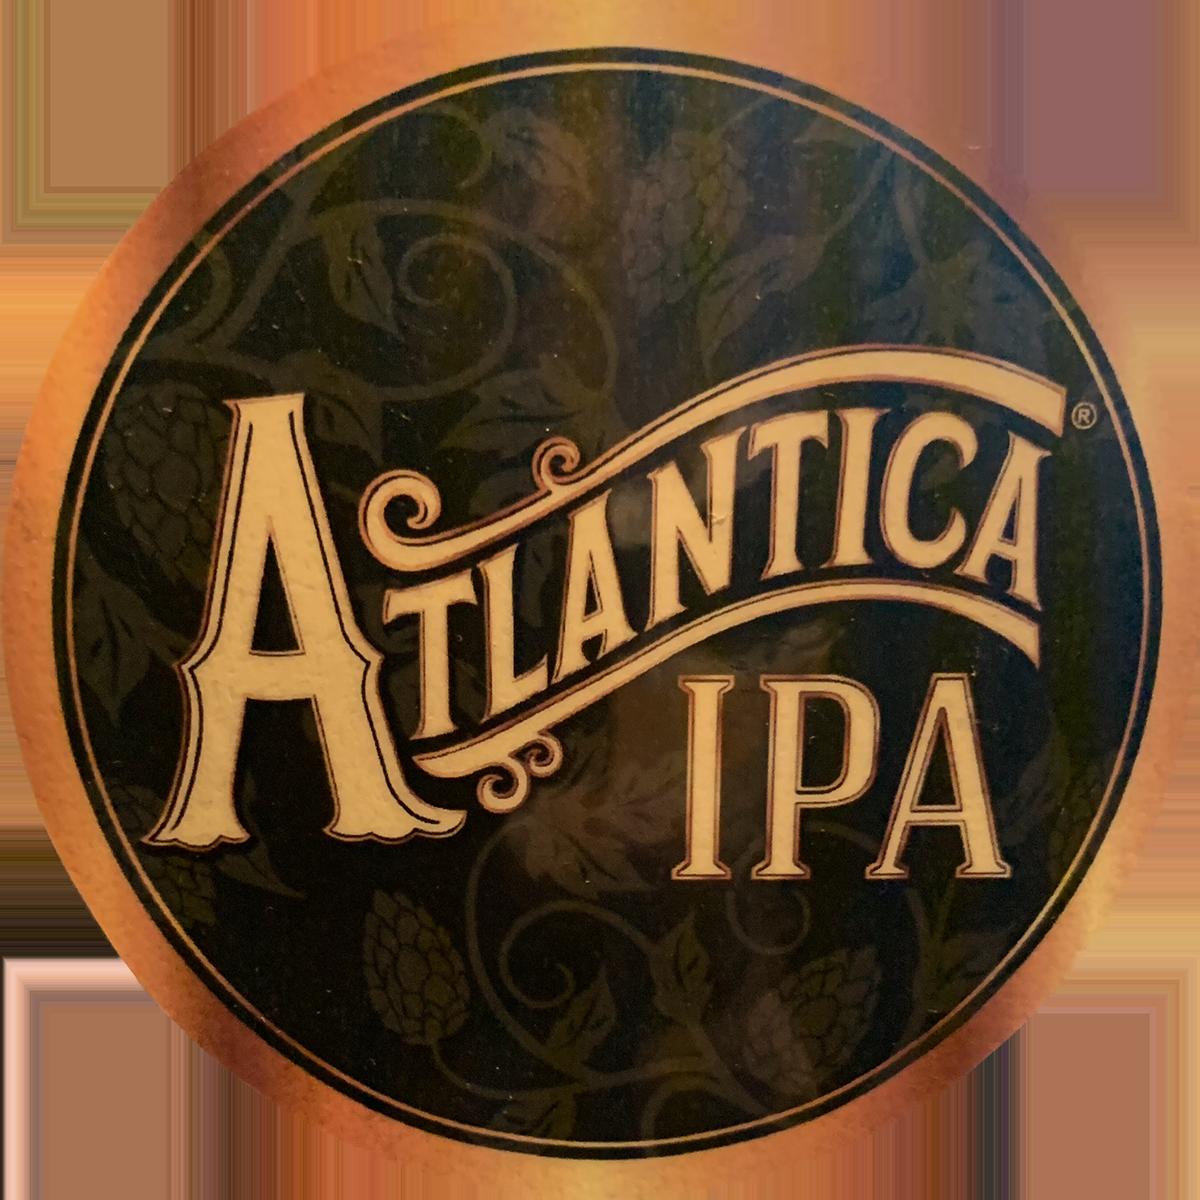 atlantica ipa